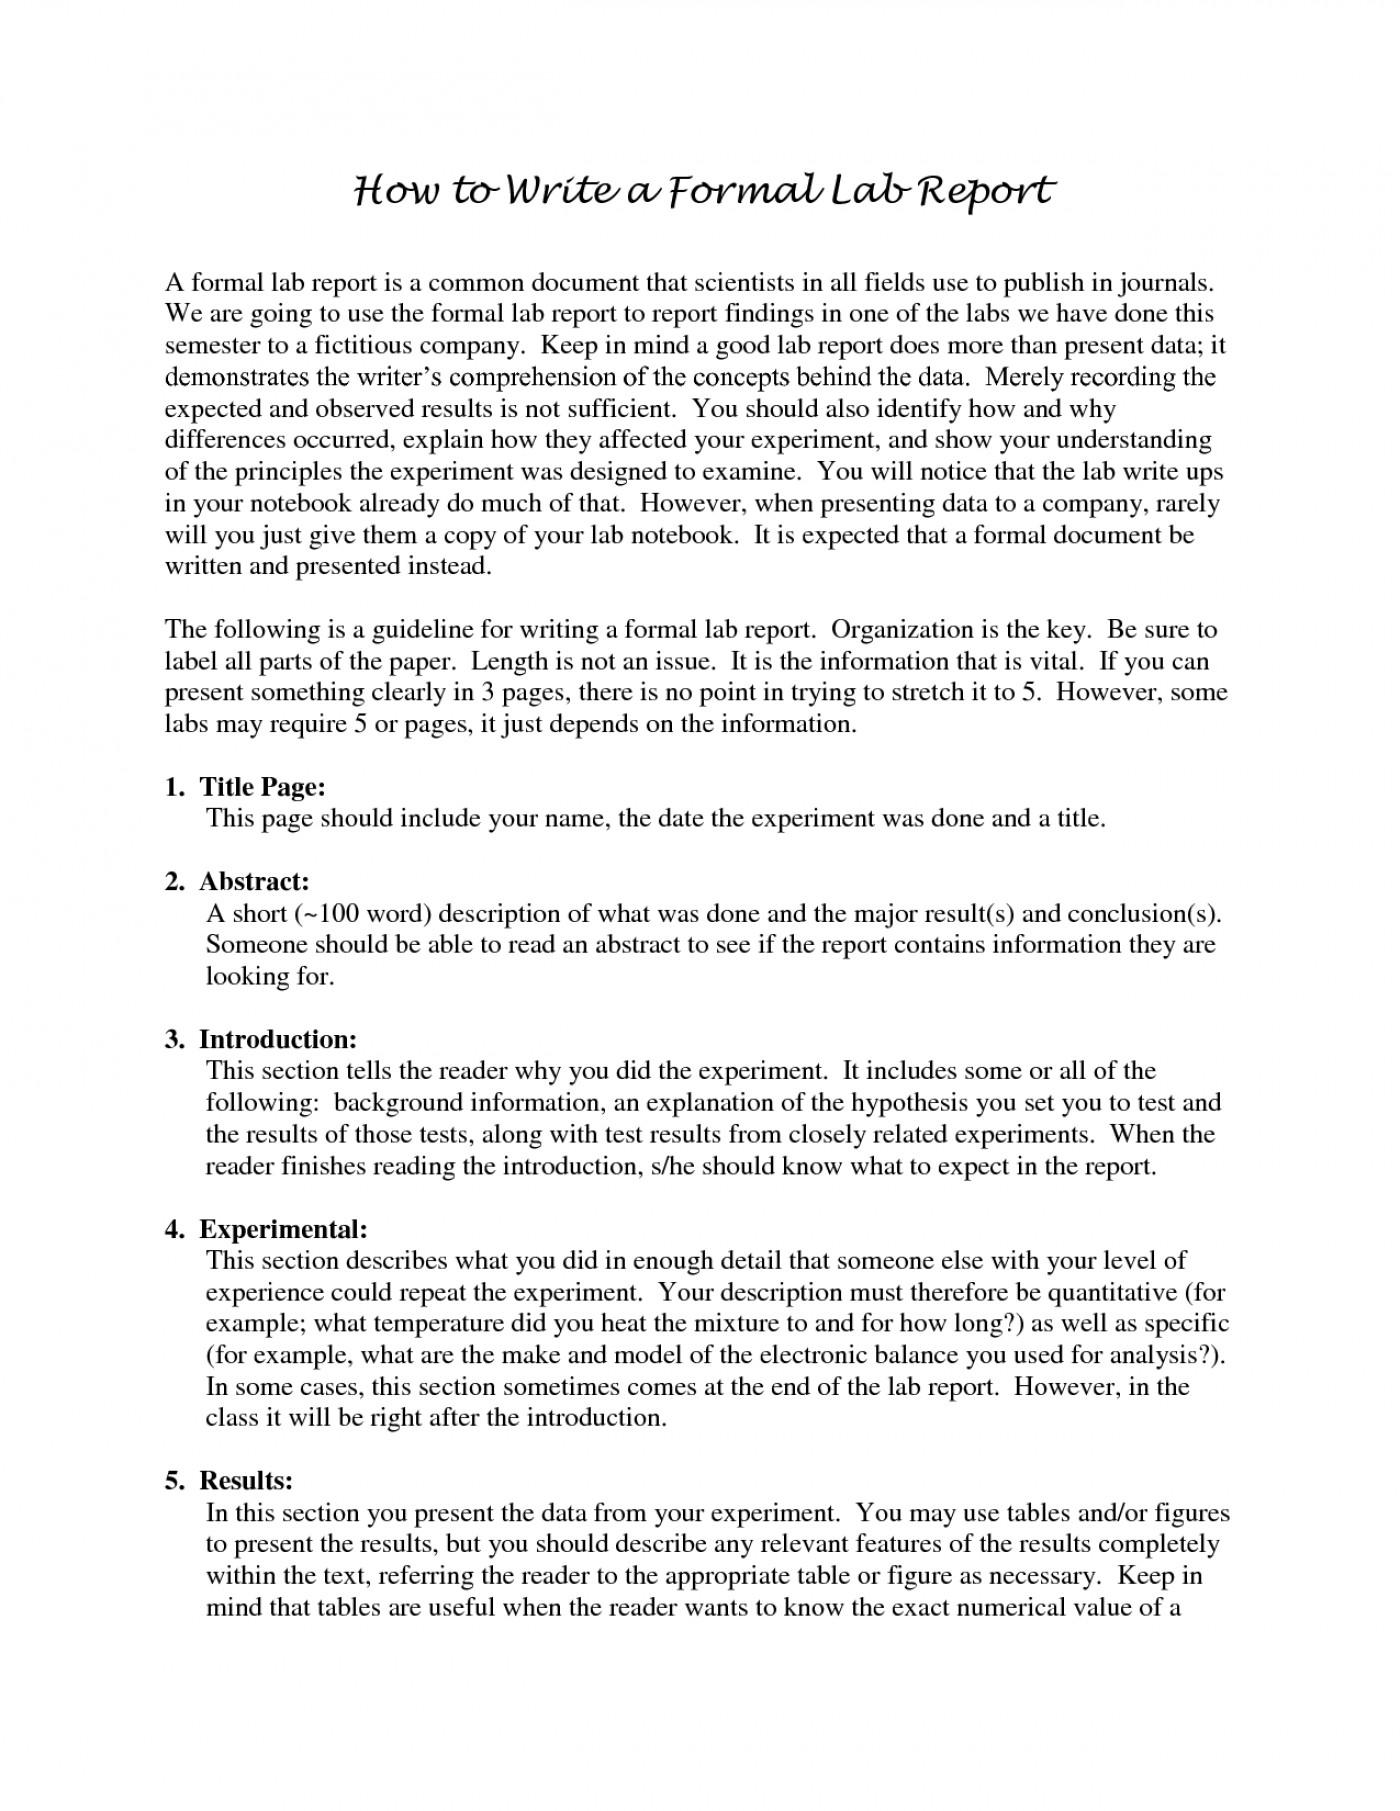 Proper essay format college